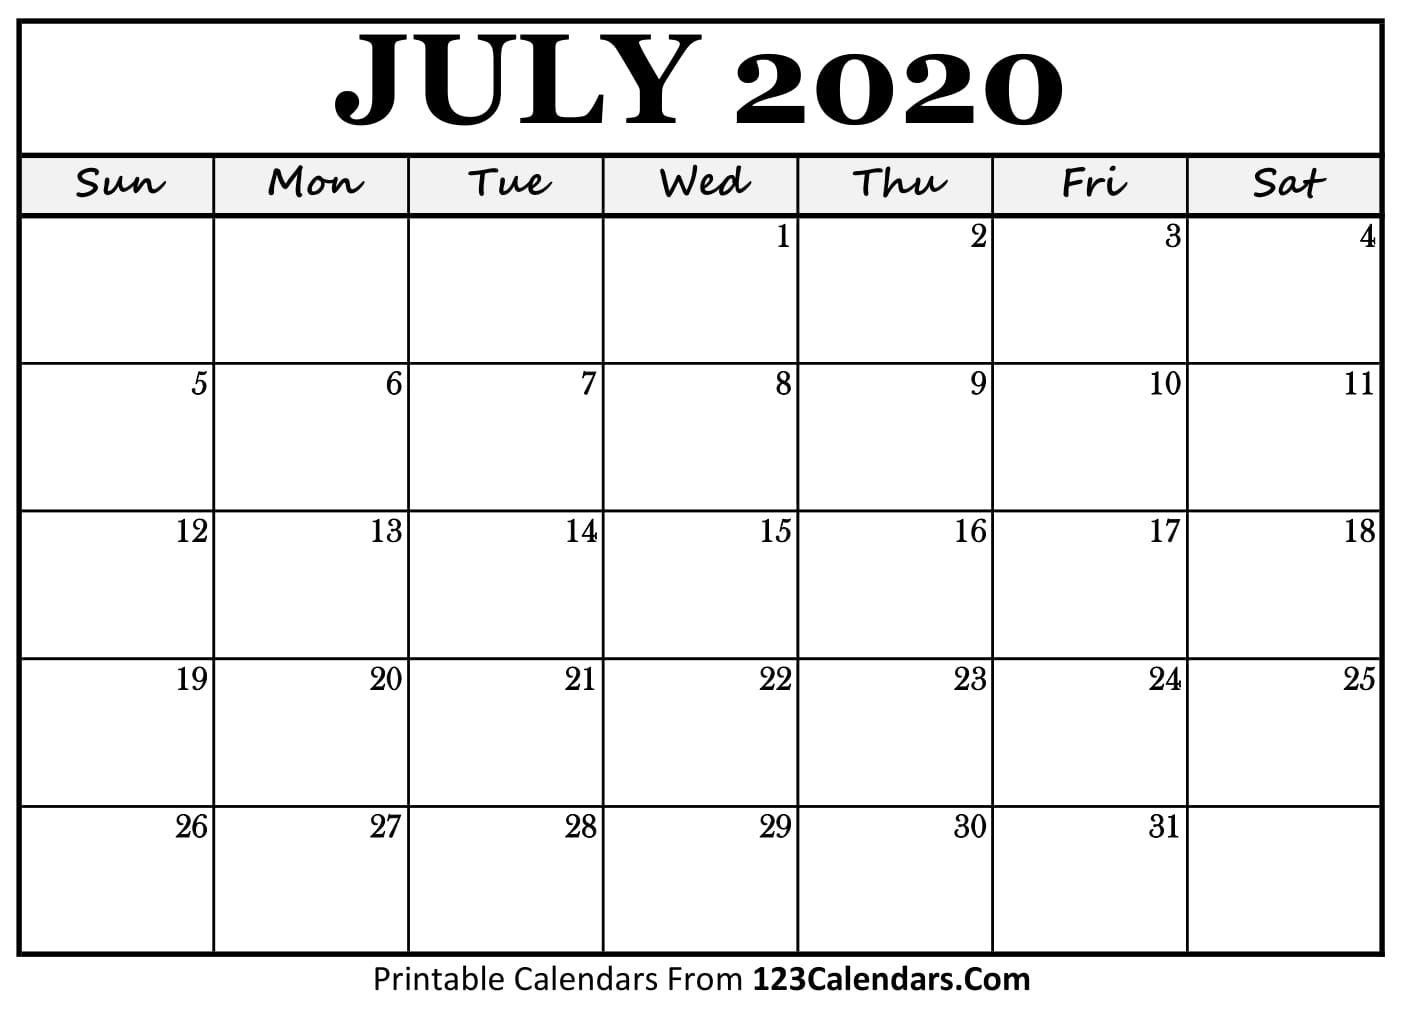 Free July 2020 Calendar | 123calendars